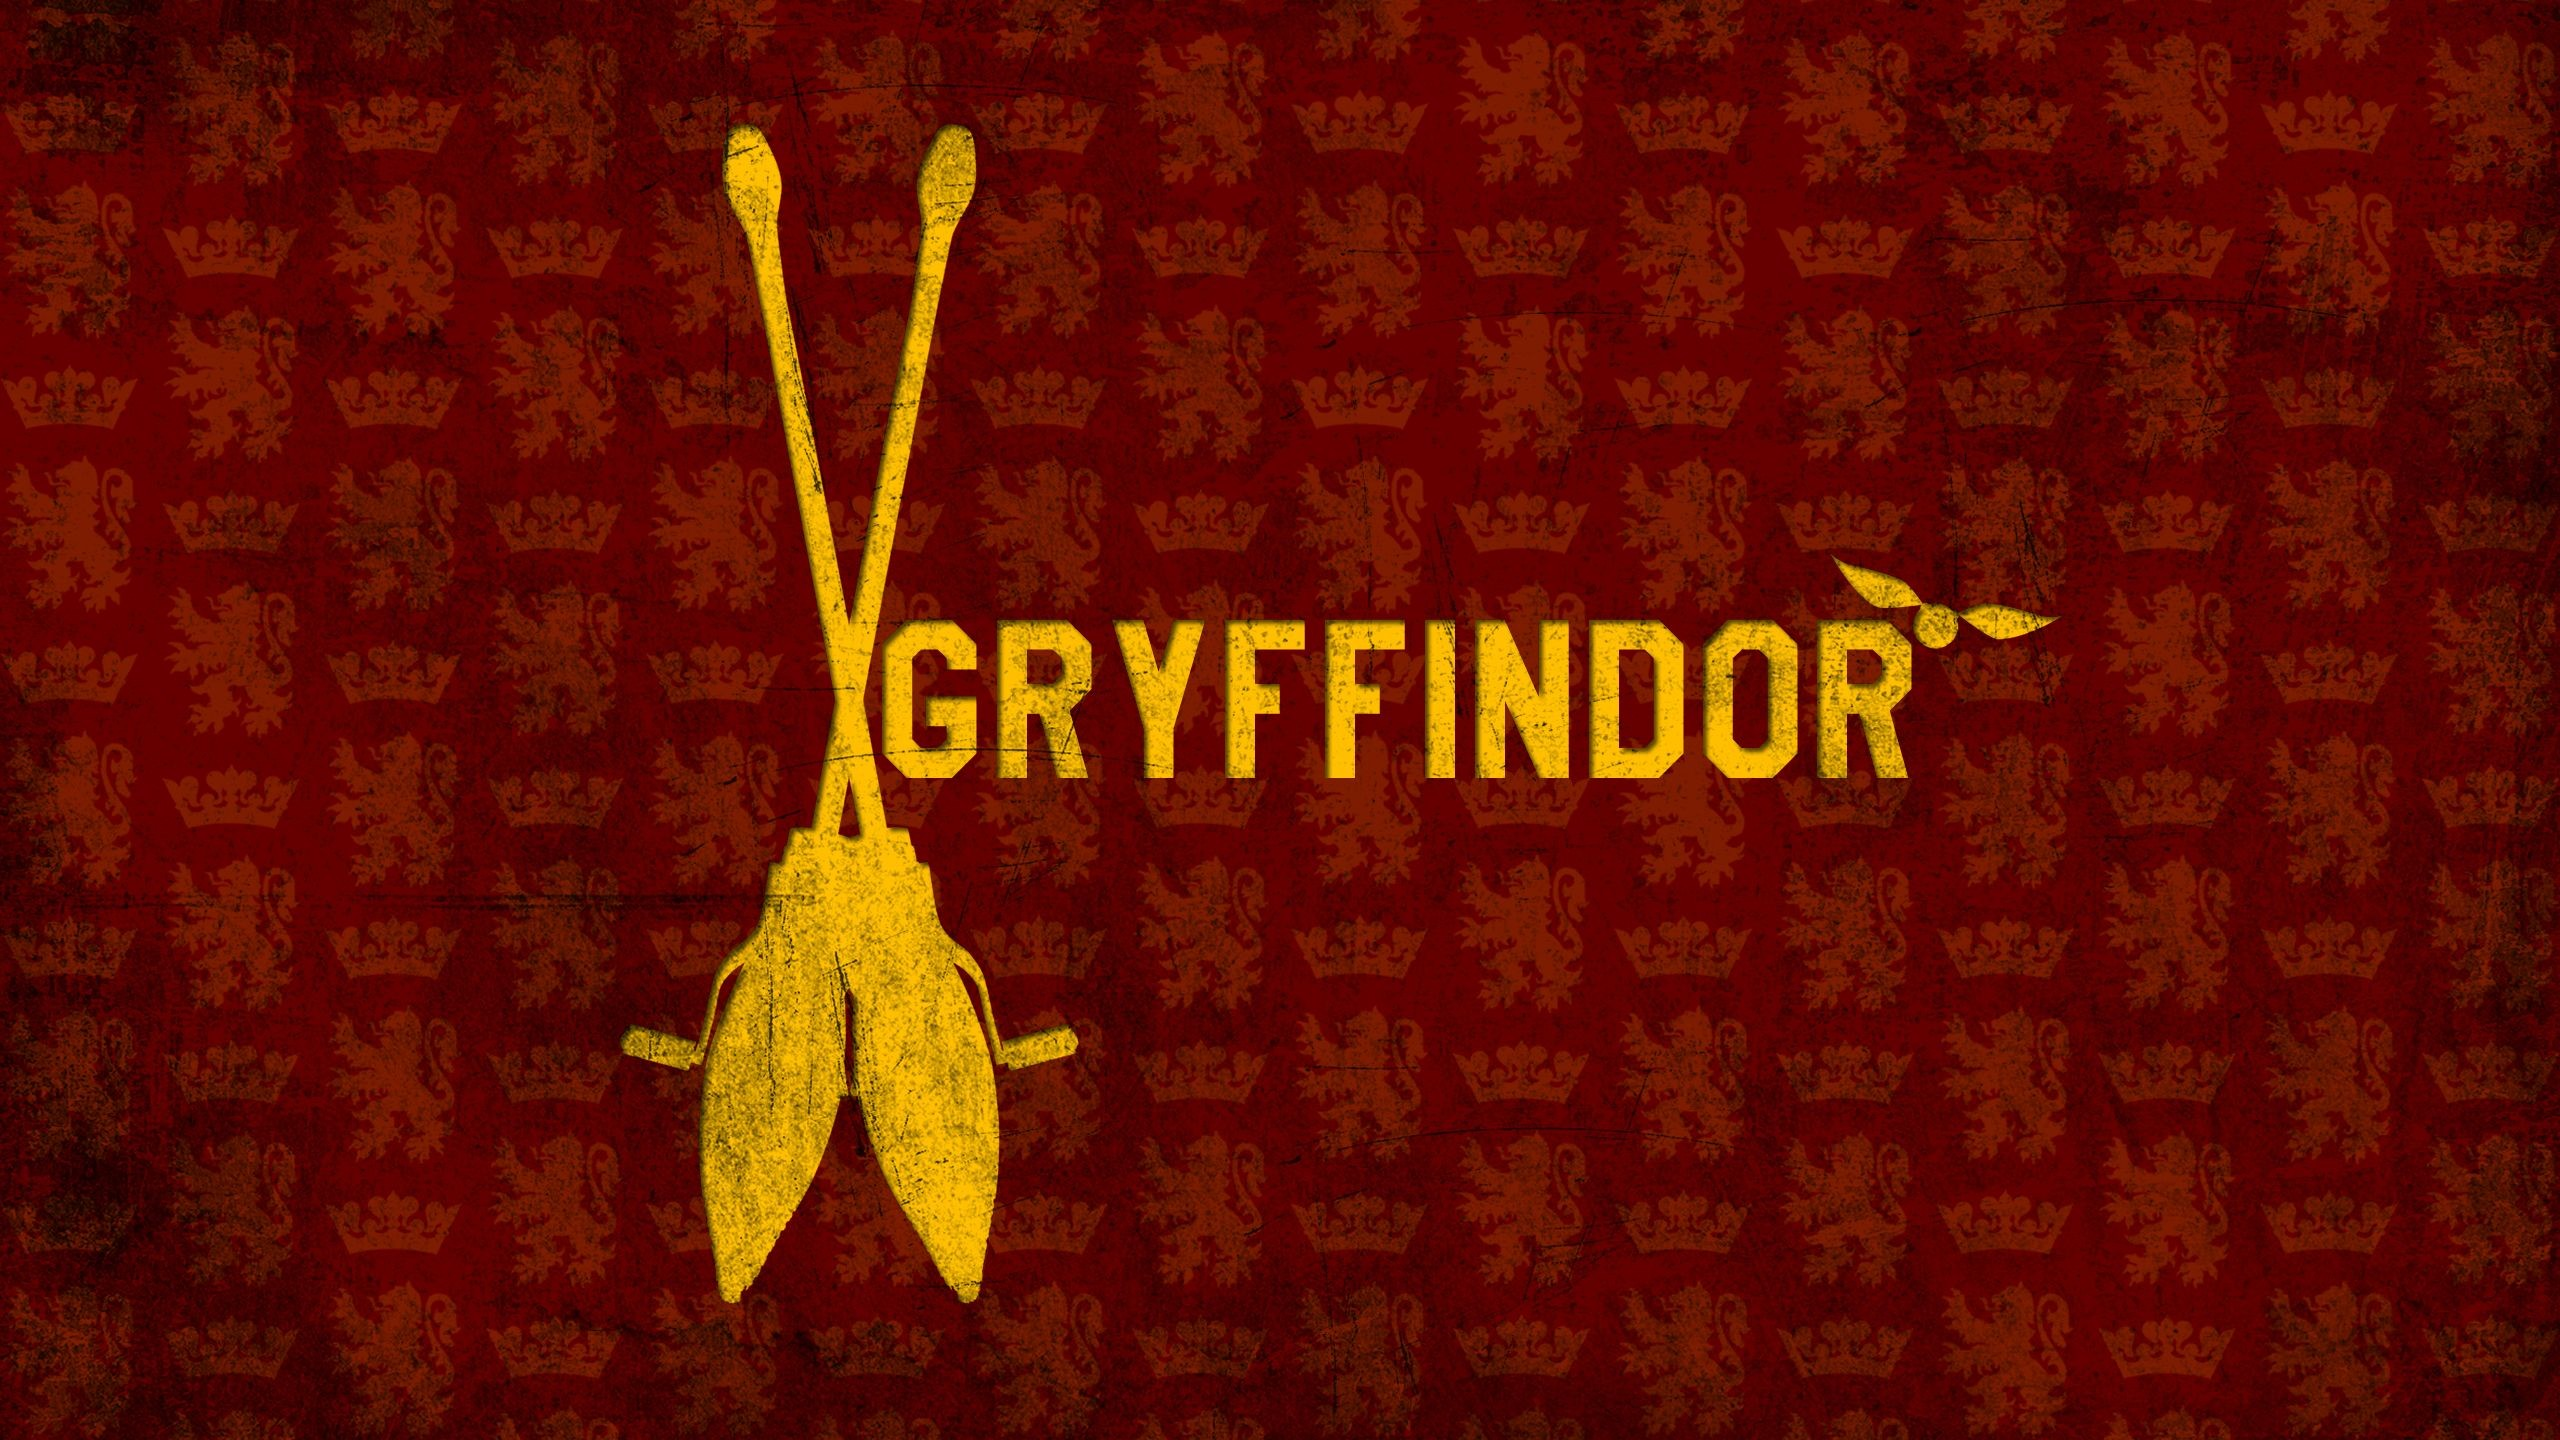 Great Wallpaper Harry Potter Autumn - 414316-widescreen-harry-potter-desktop-backgrounds-2560x1440-for-iphone  Pictures_547122.jpg